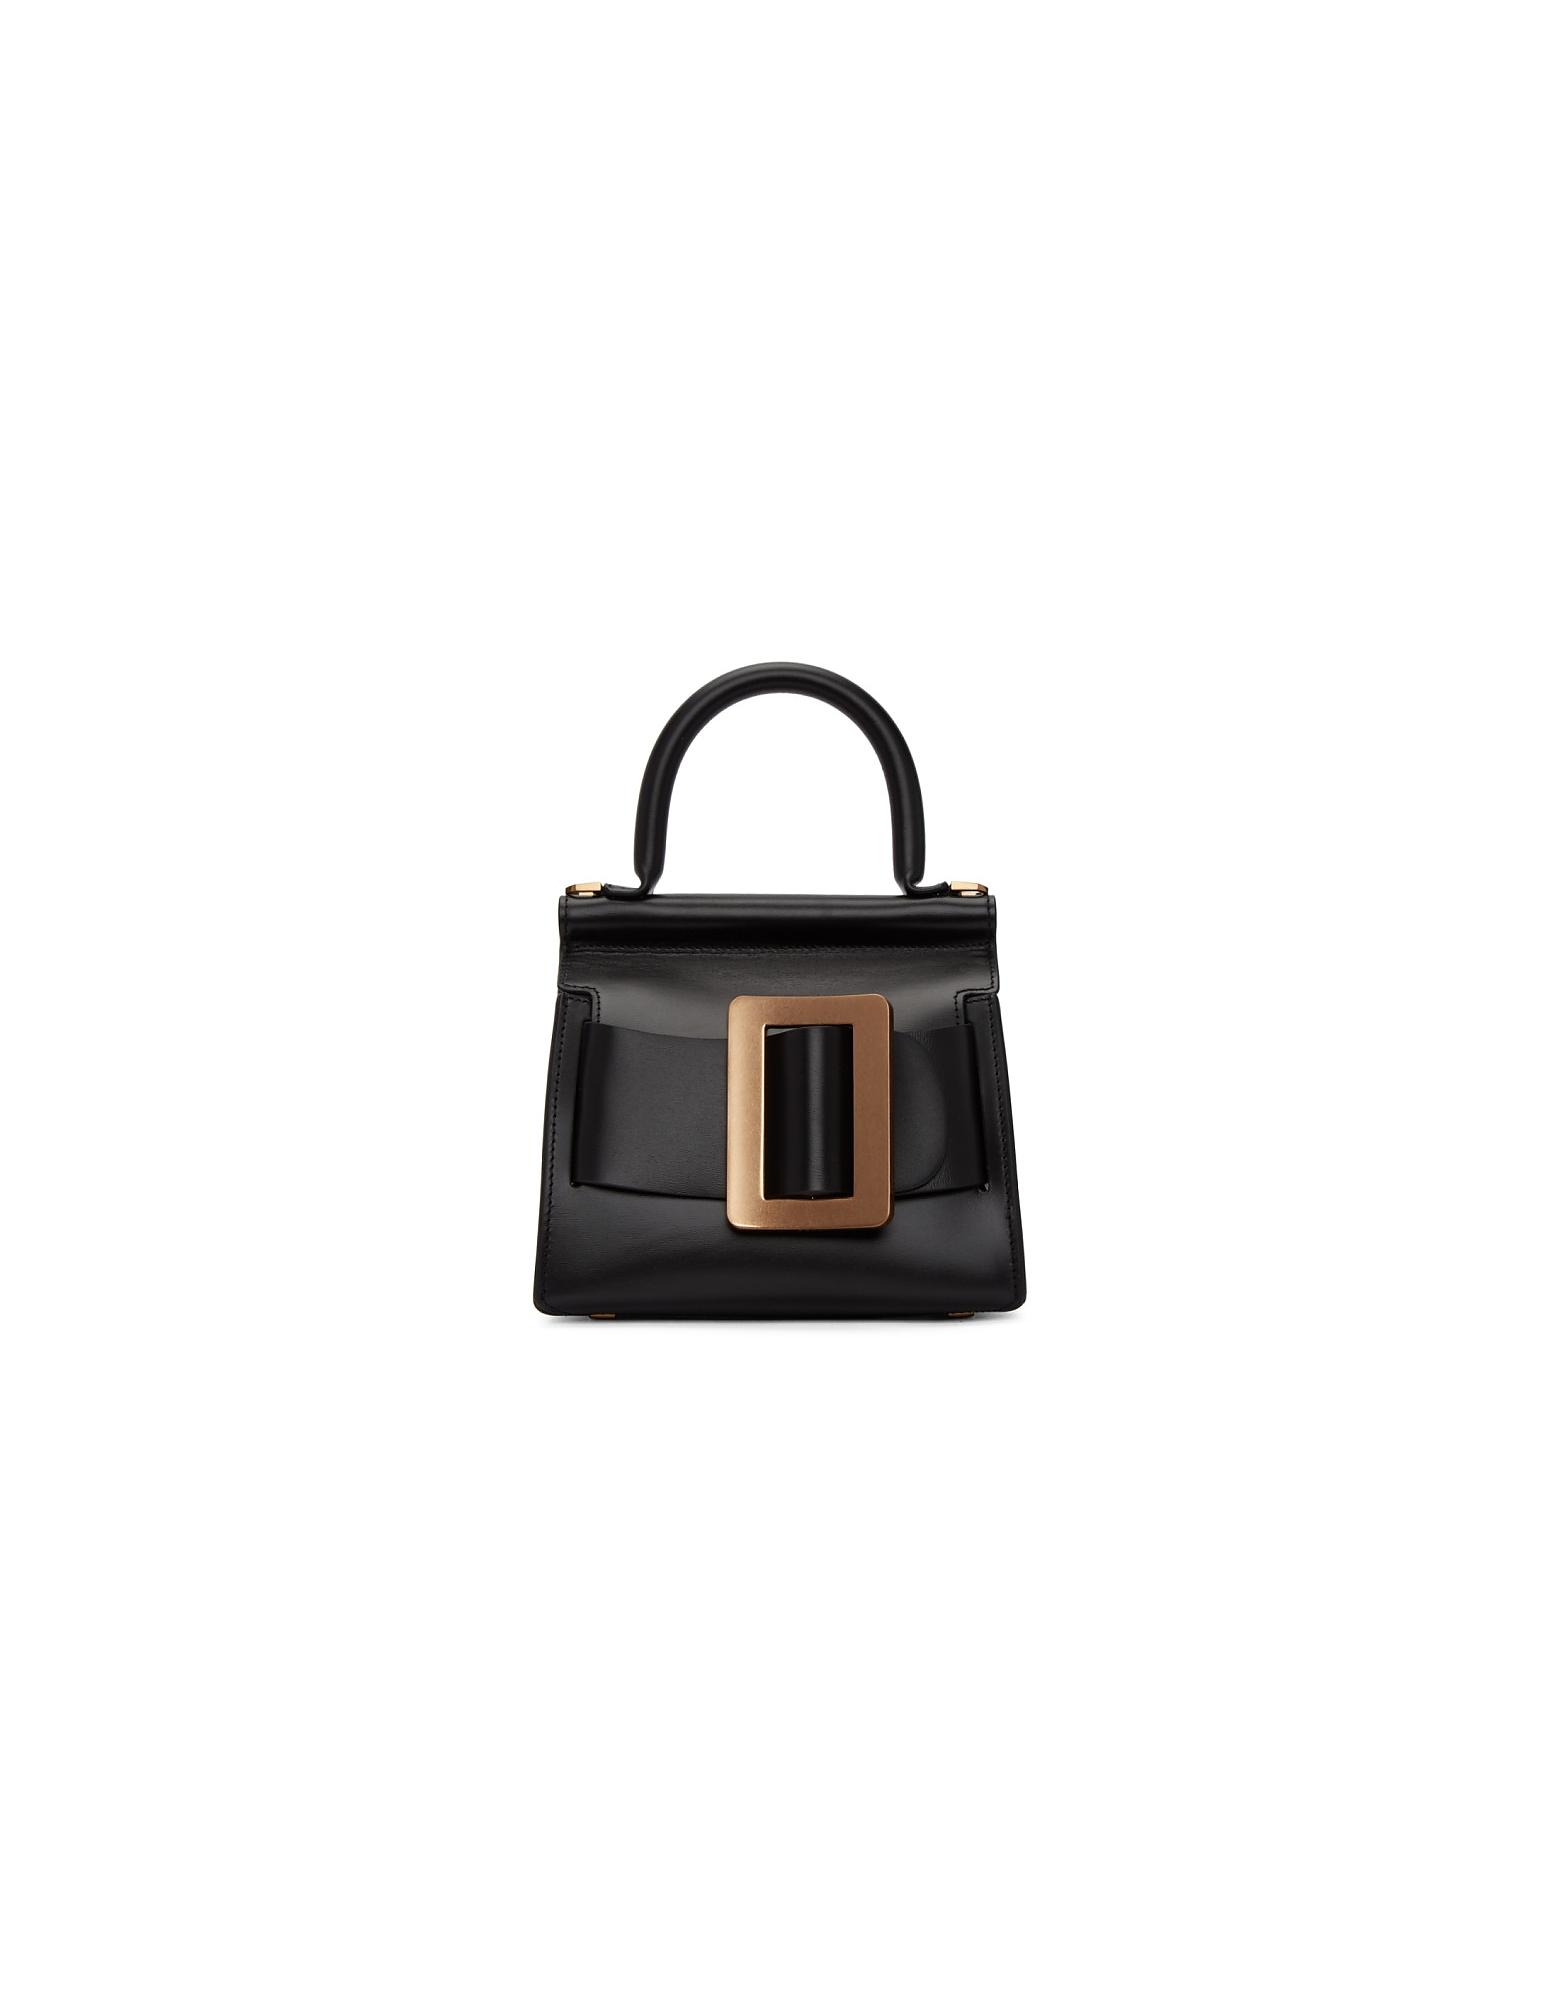 BOYY Designer Handbags, Black Karl 19 Top Handle Bag